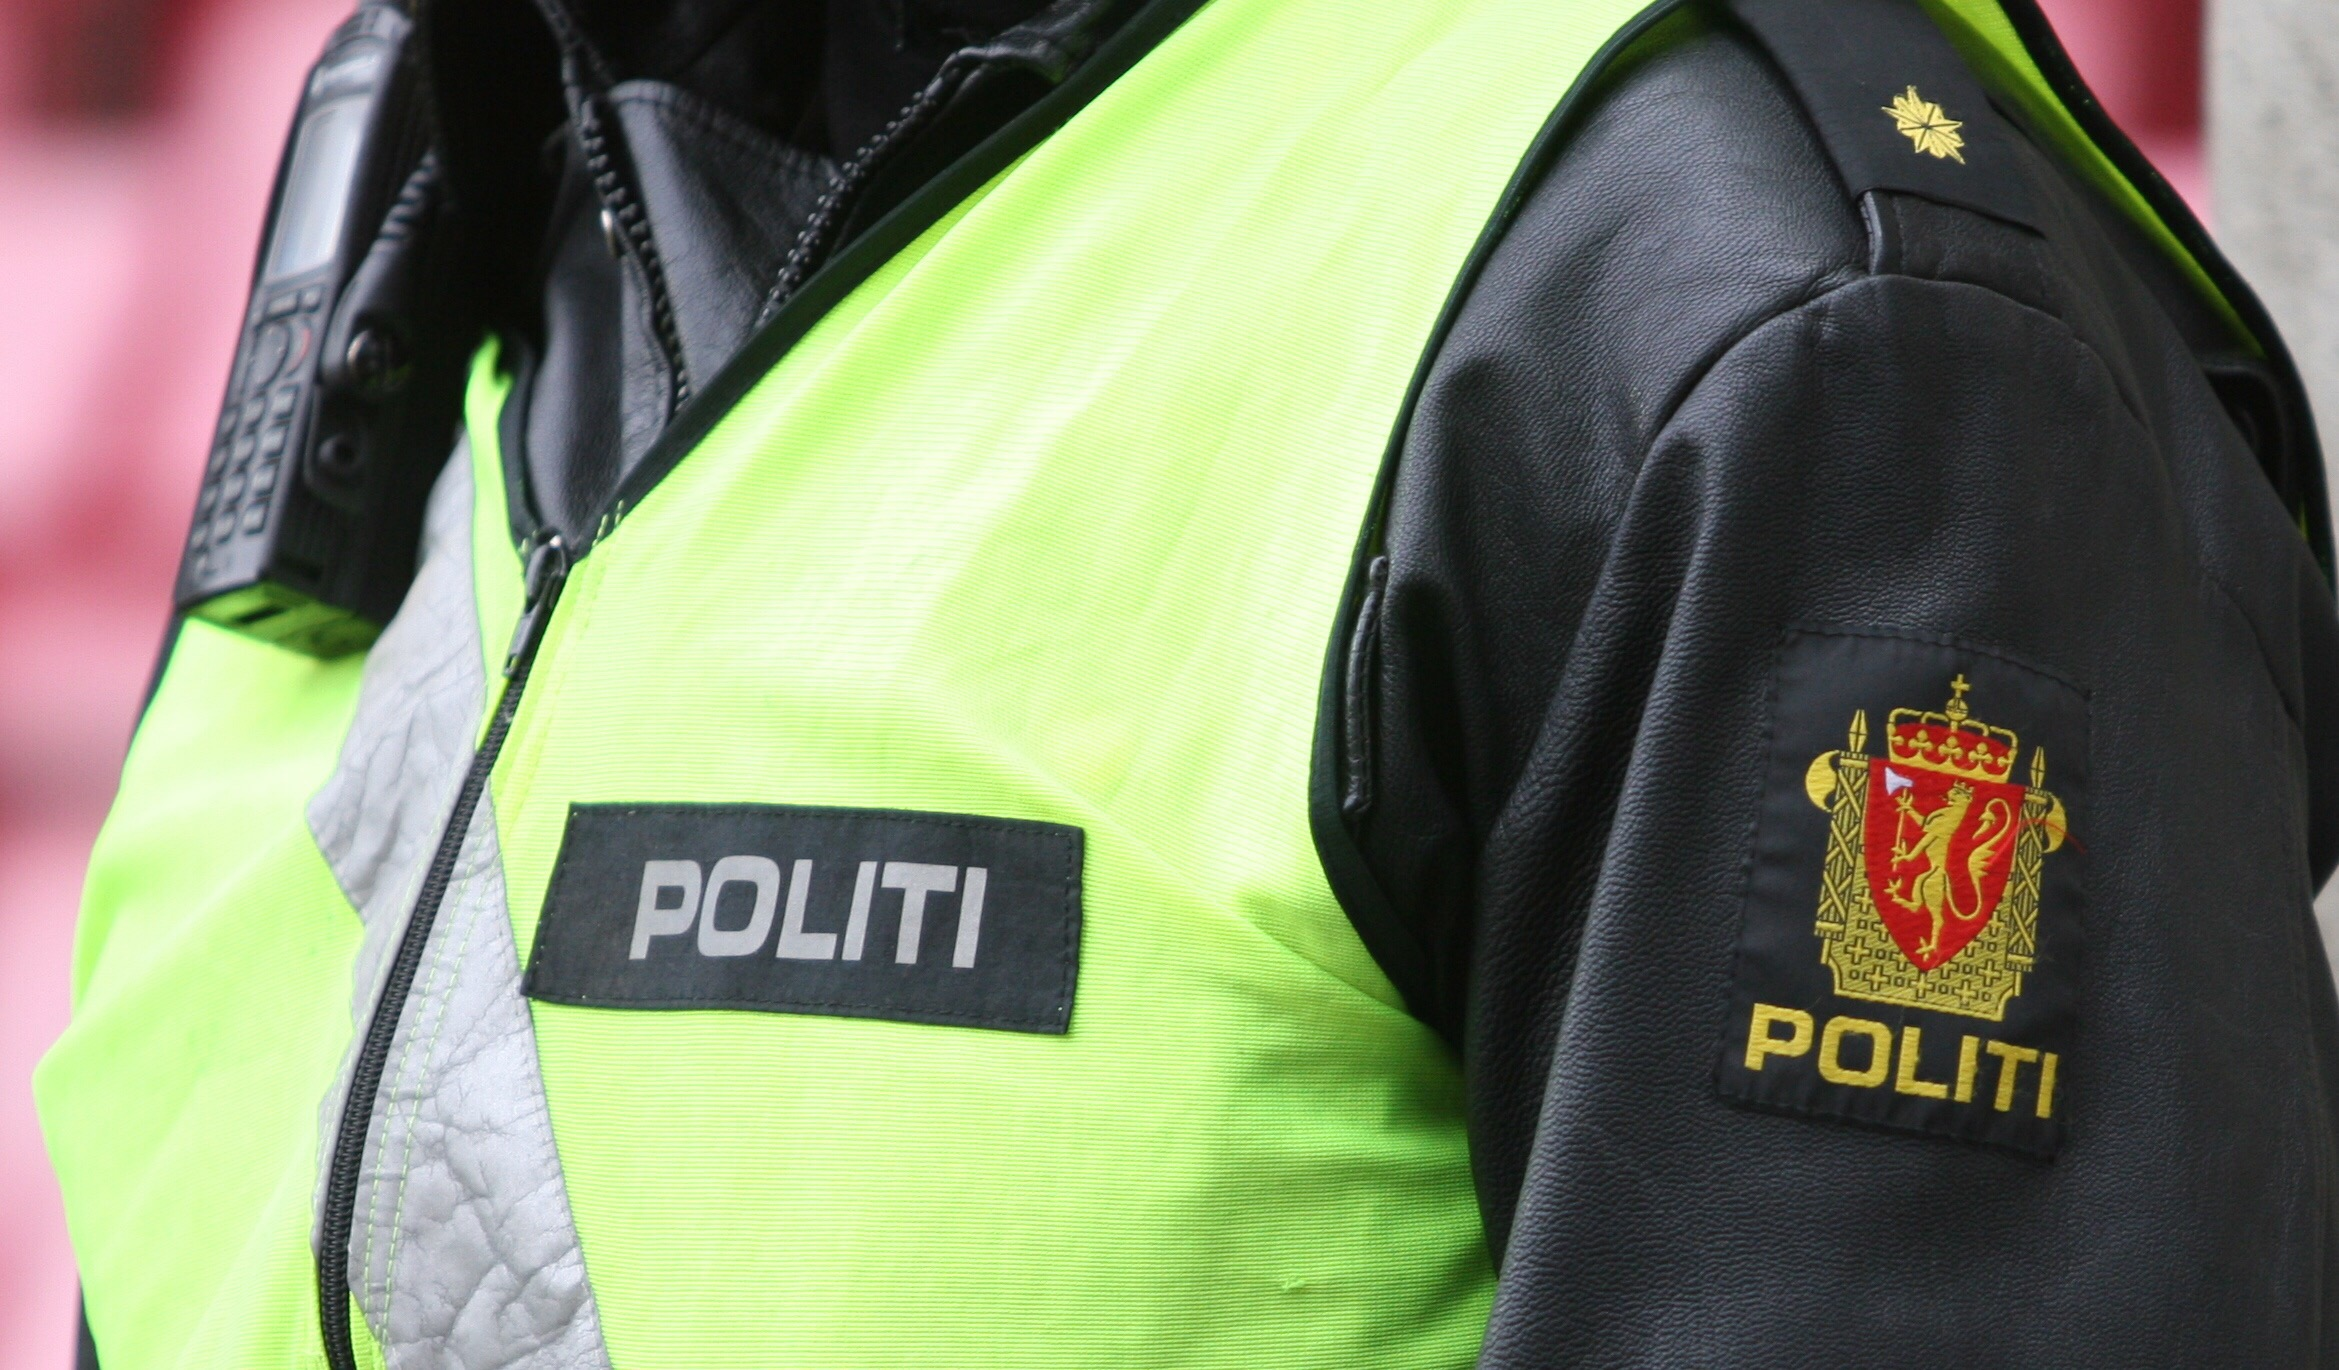 Amfetaminrekord i norge